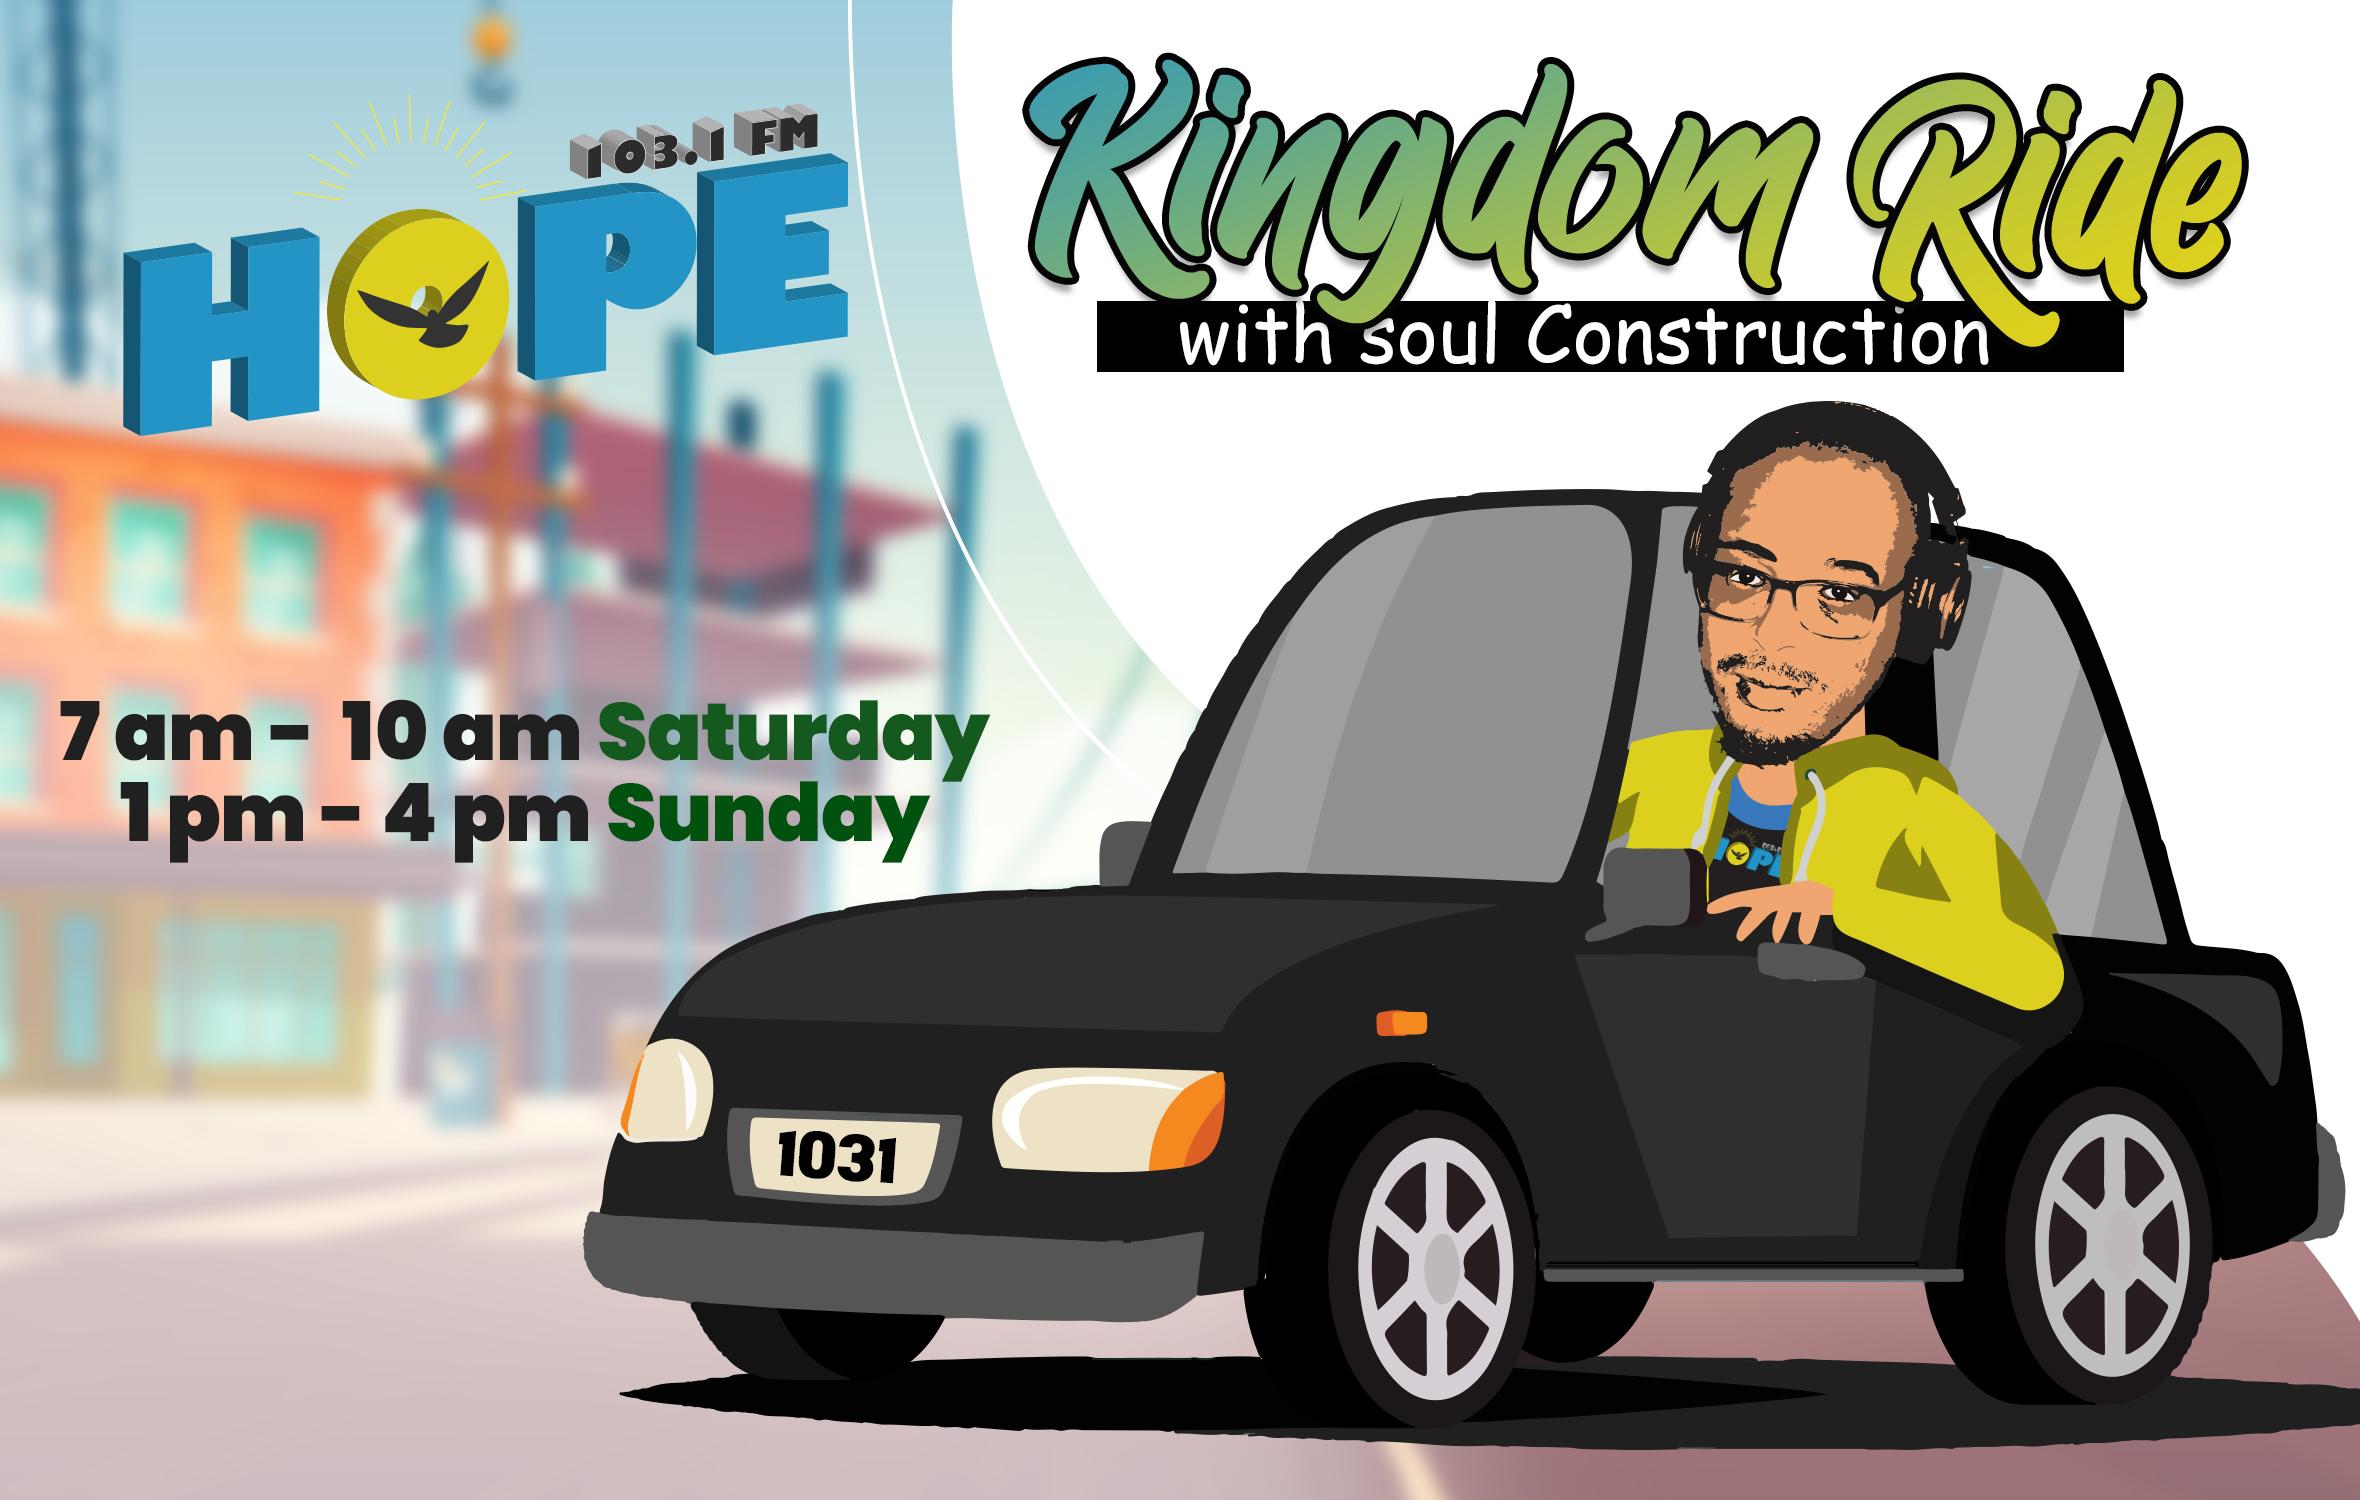 Kingdom Ride